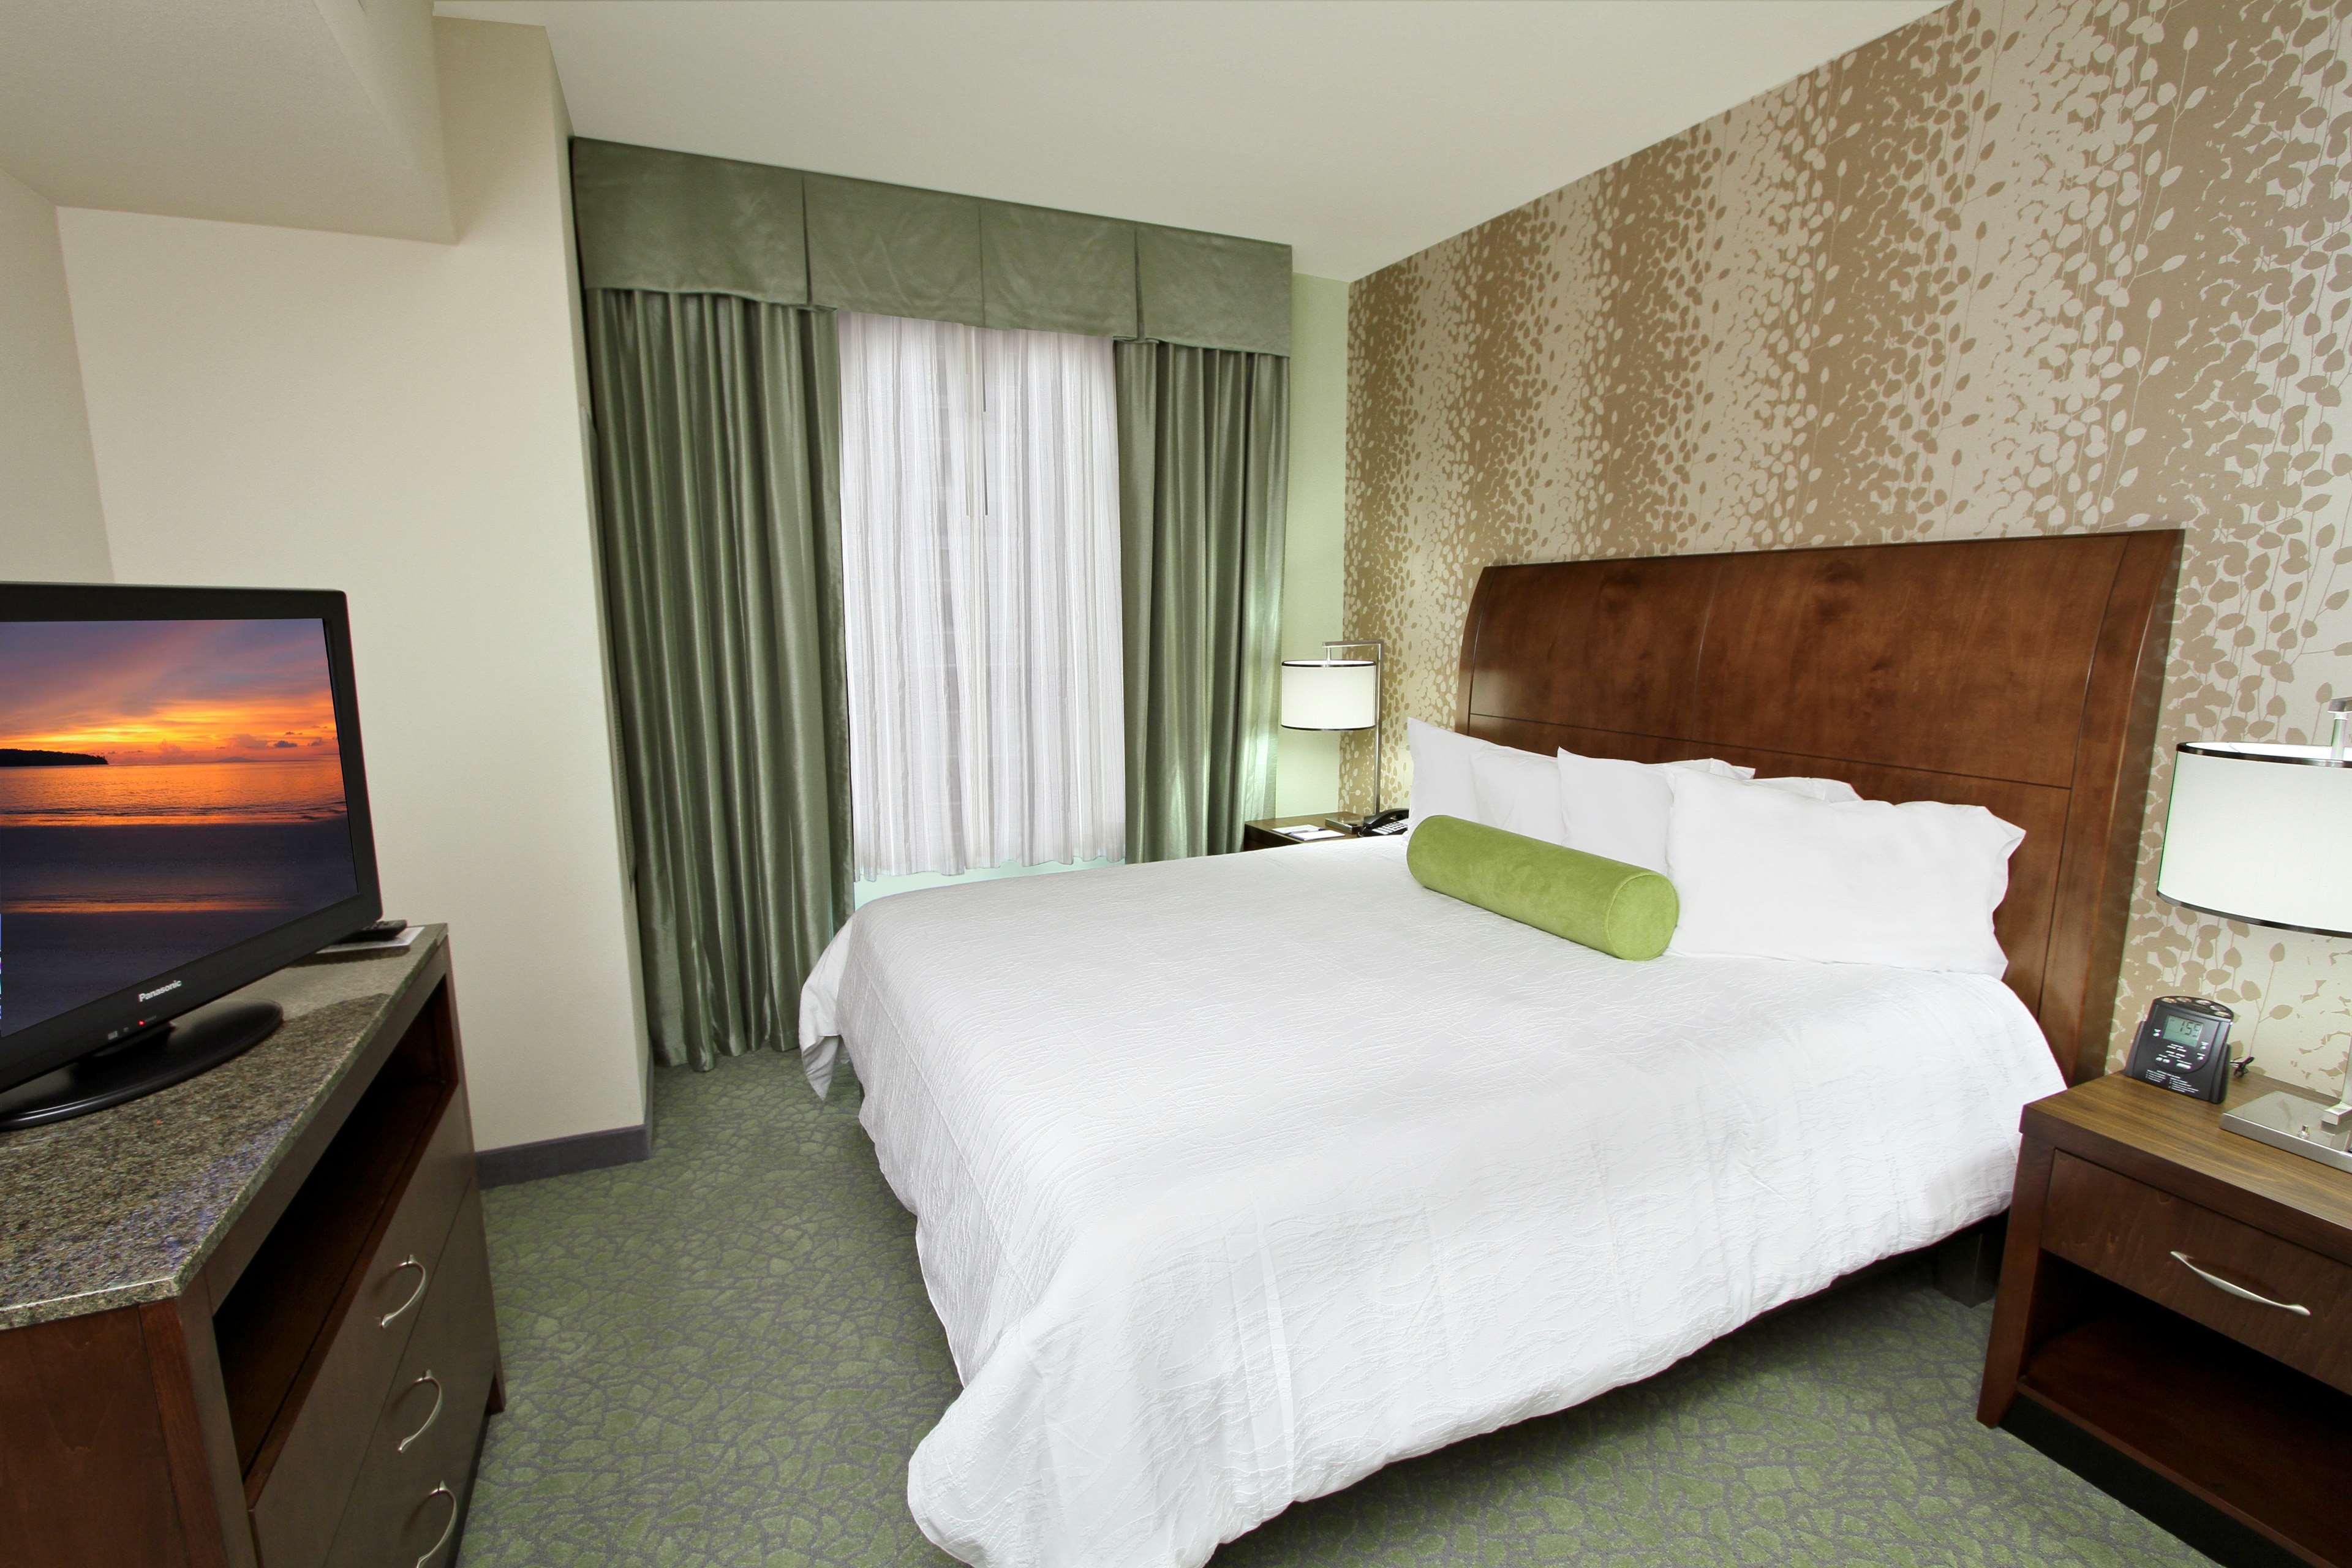 Hilton Garden Inn Covington/Mandeville image 12